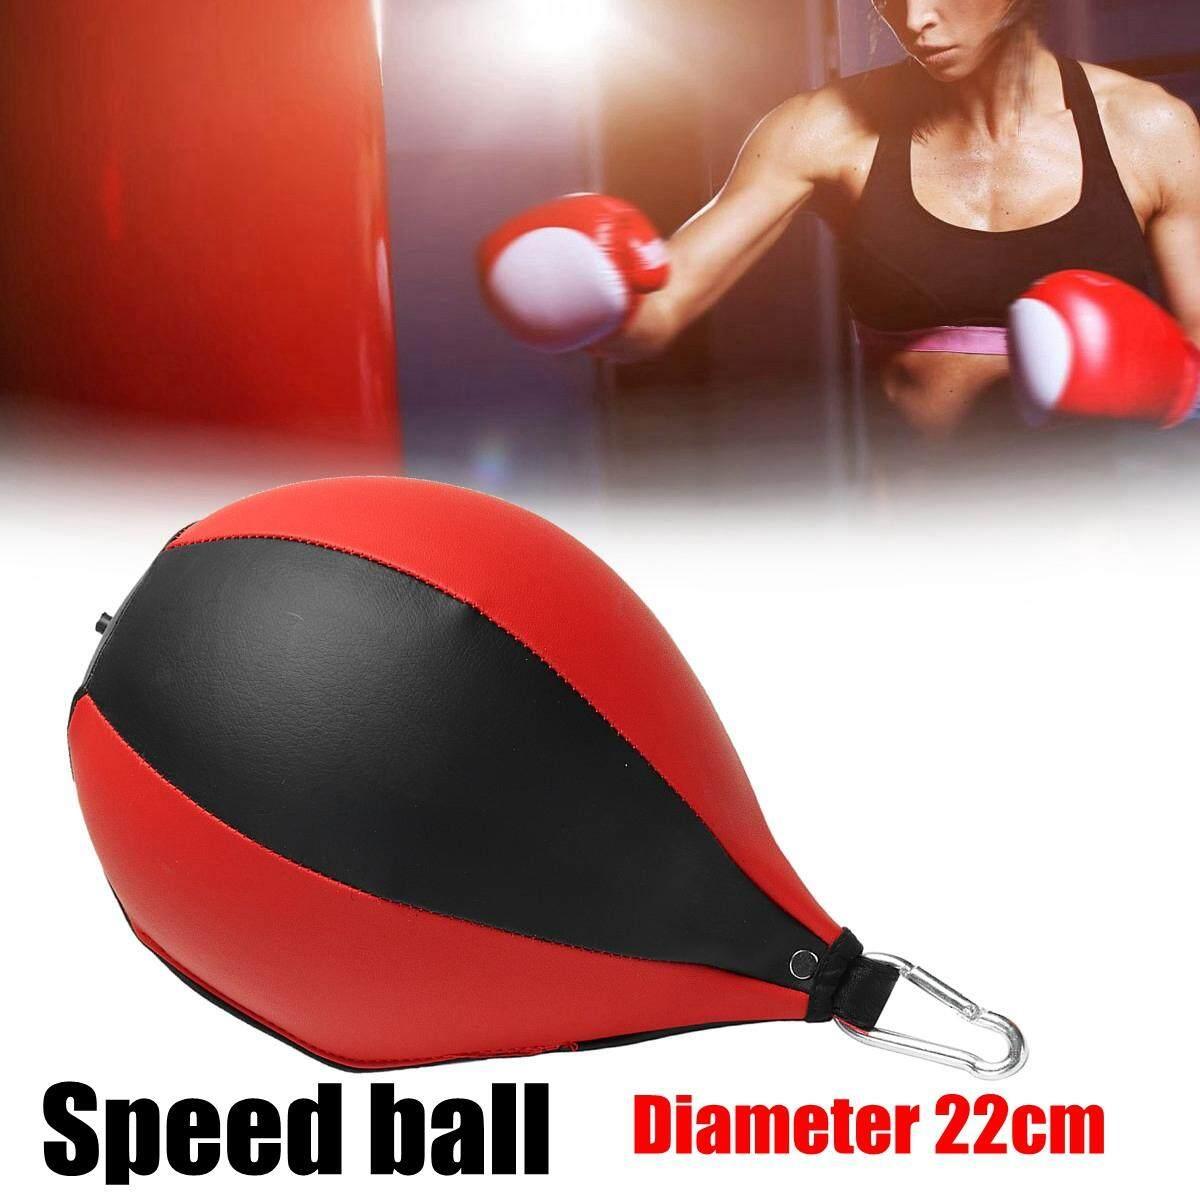 Desktop PU Punching Bag Speed Ball Toy Stress Buster Adult Sport Boxing Training